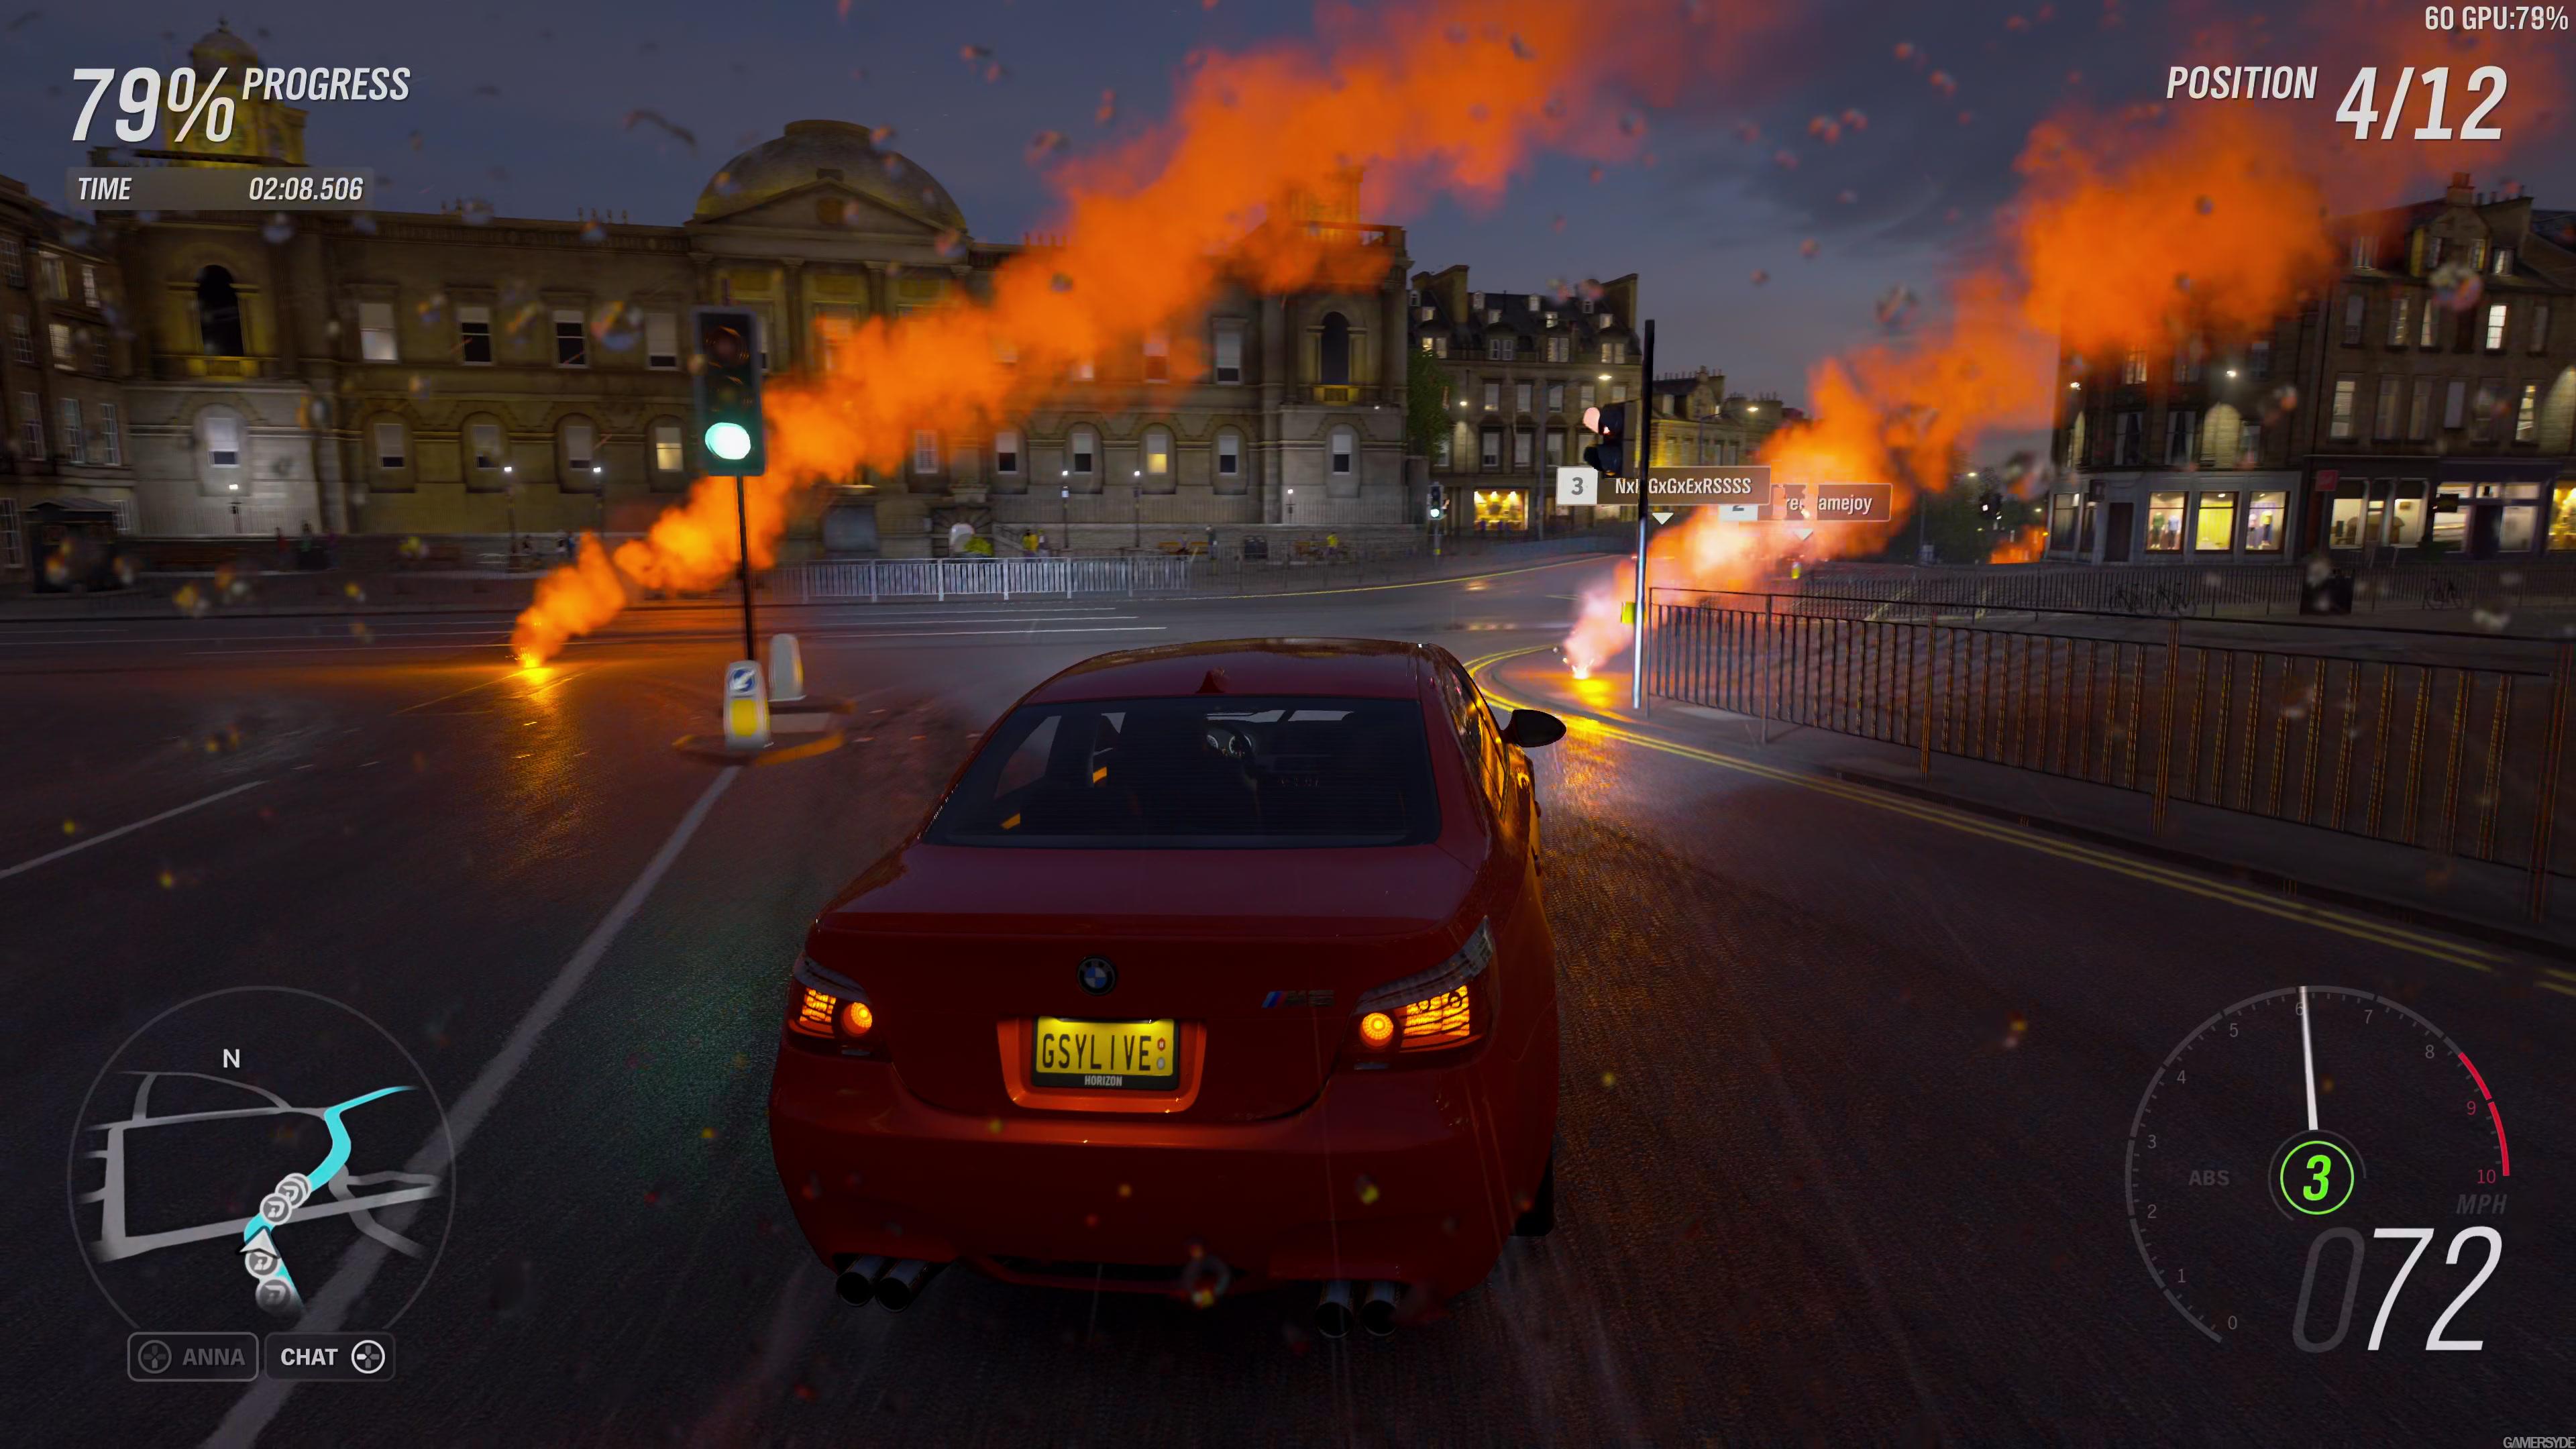 Forza Horizon 4 - PC - 4K HDR Video 2 - High quality stream